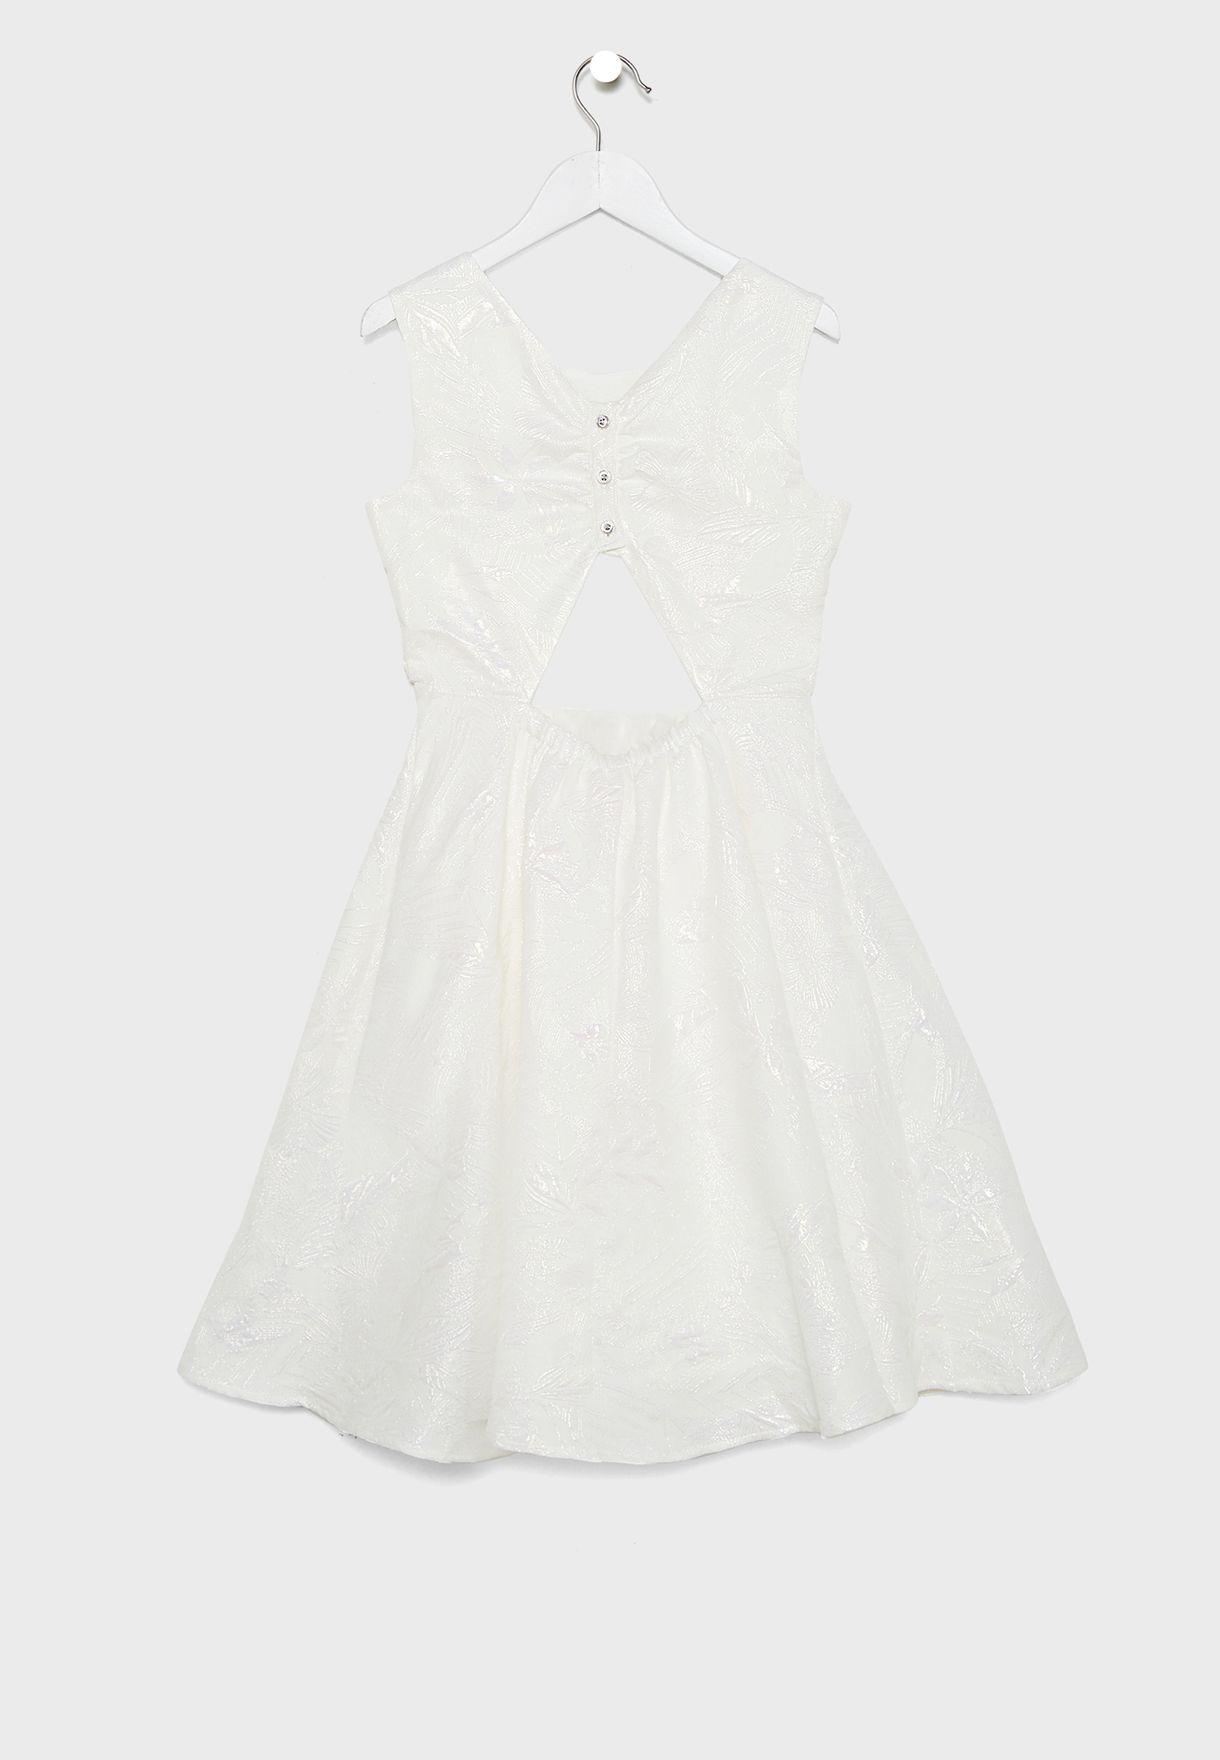 فستان جاكار بدون اكمام